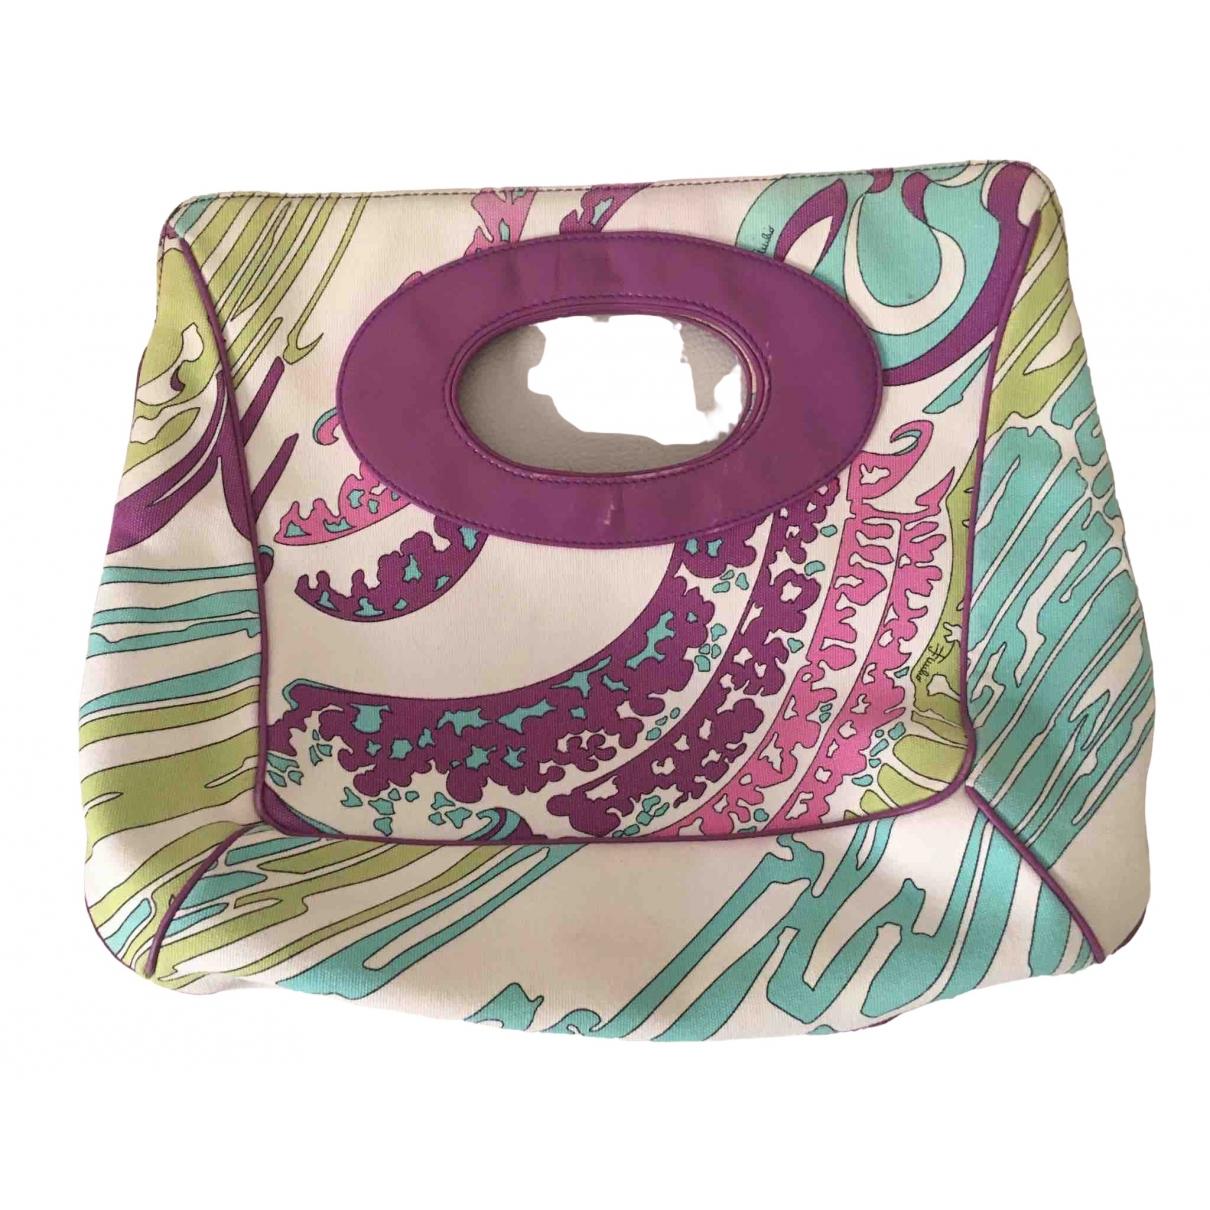 Emilio Pucci \N Multicolour Cloth handbag for Women \N